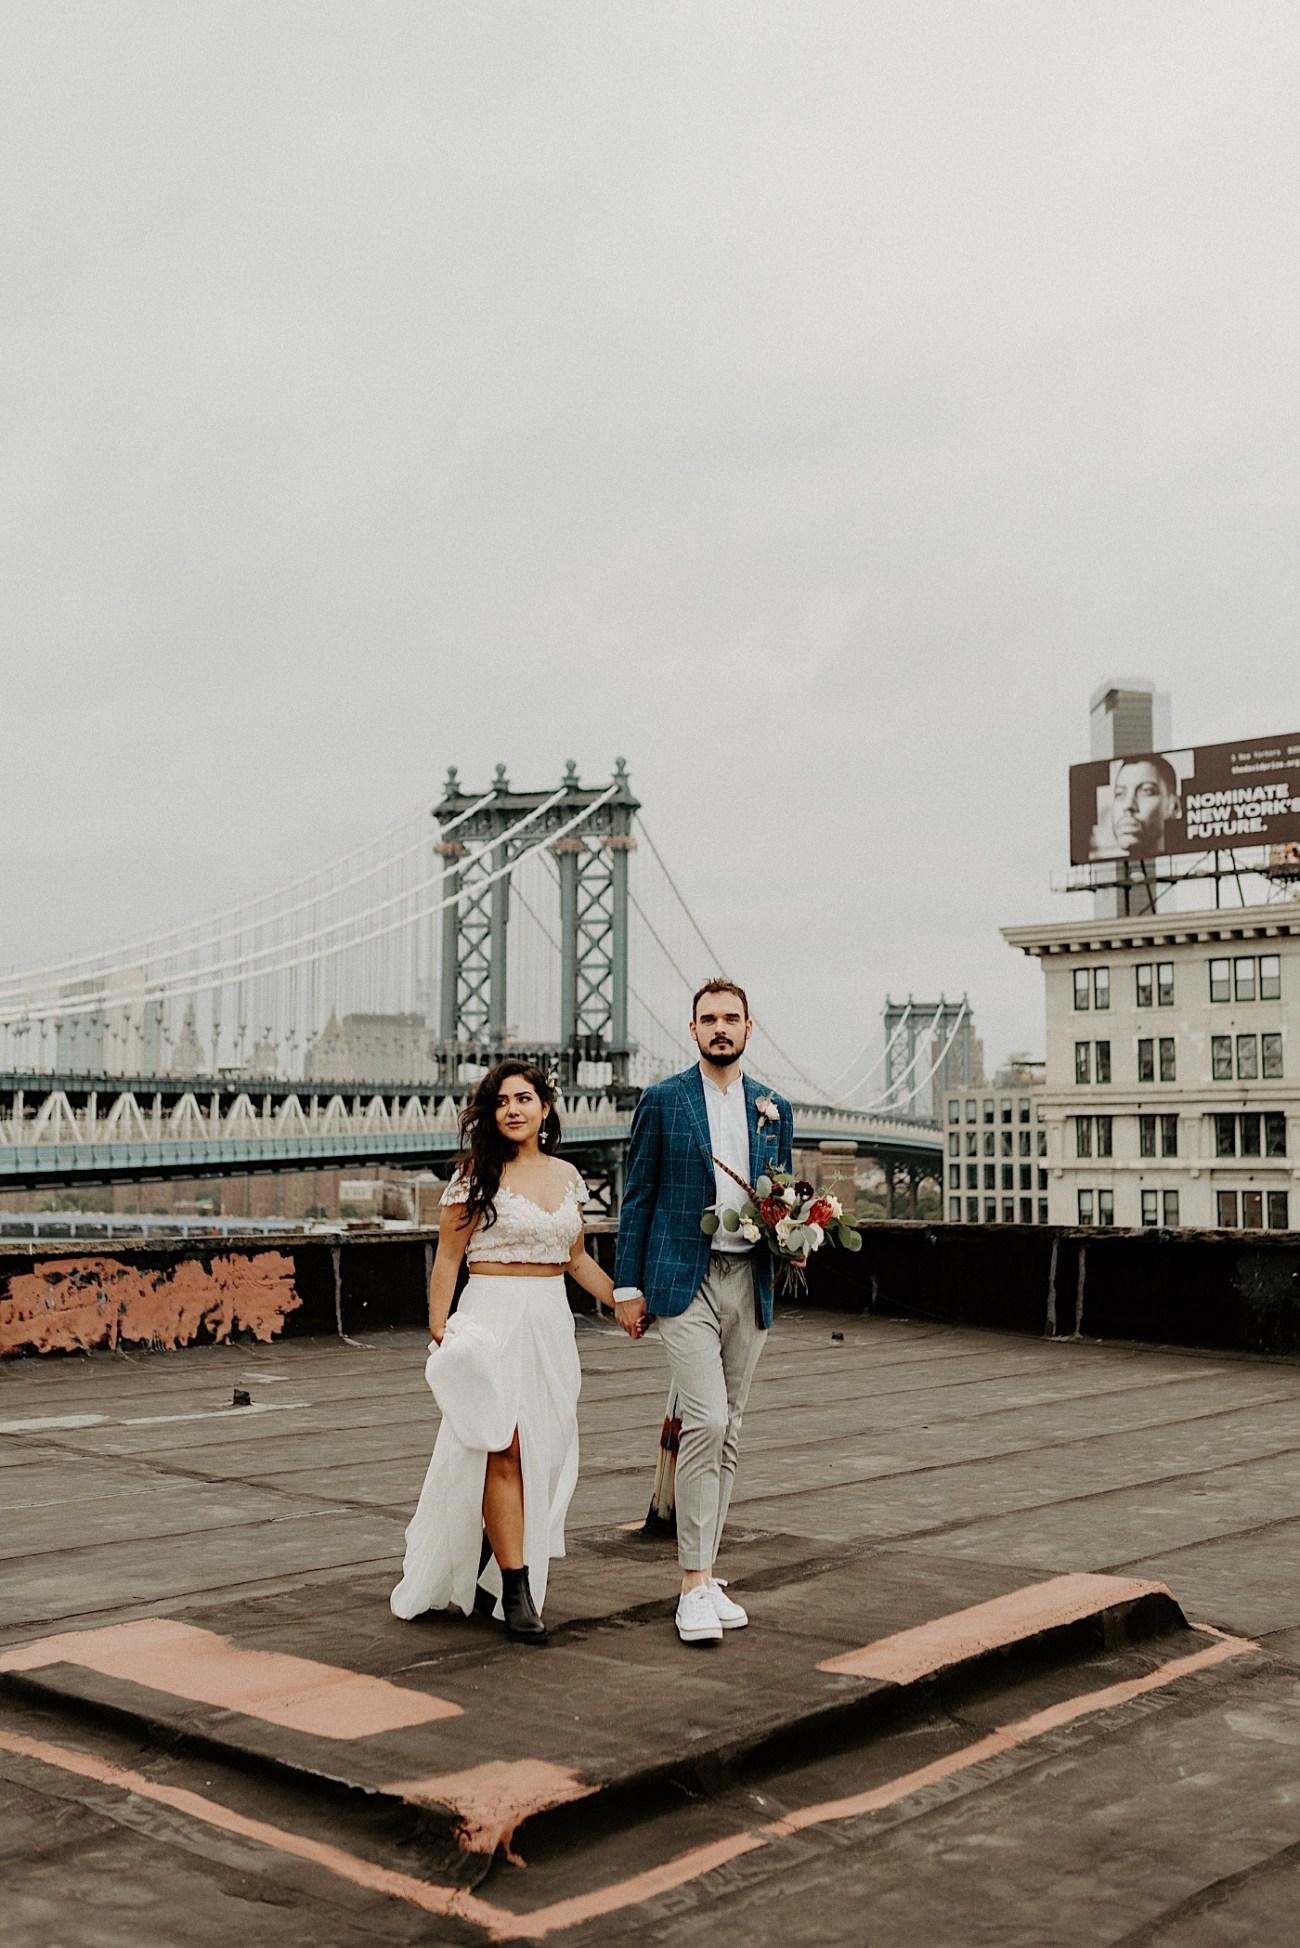 LIC Wedding Greenpoint Wedding LIC Elopement New York Wedding Photographer 085